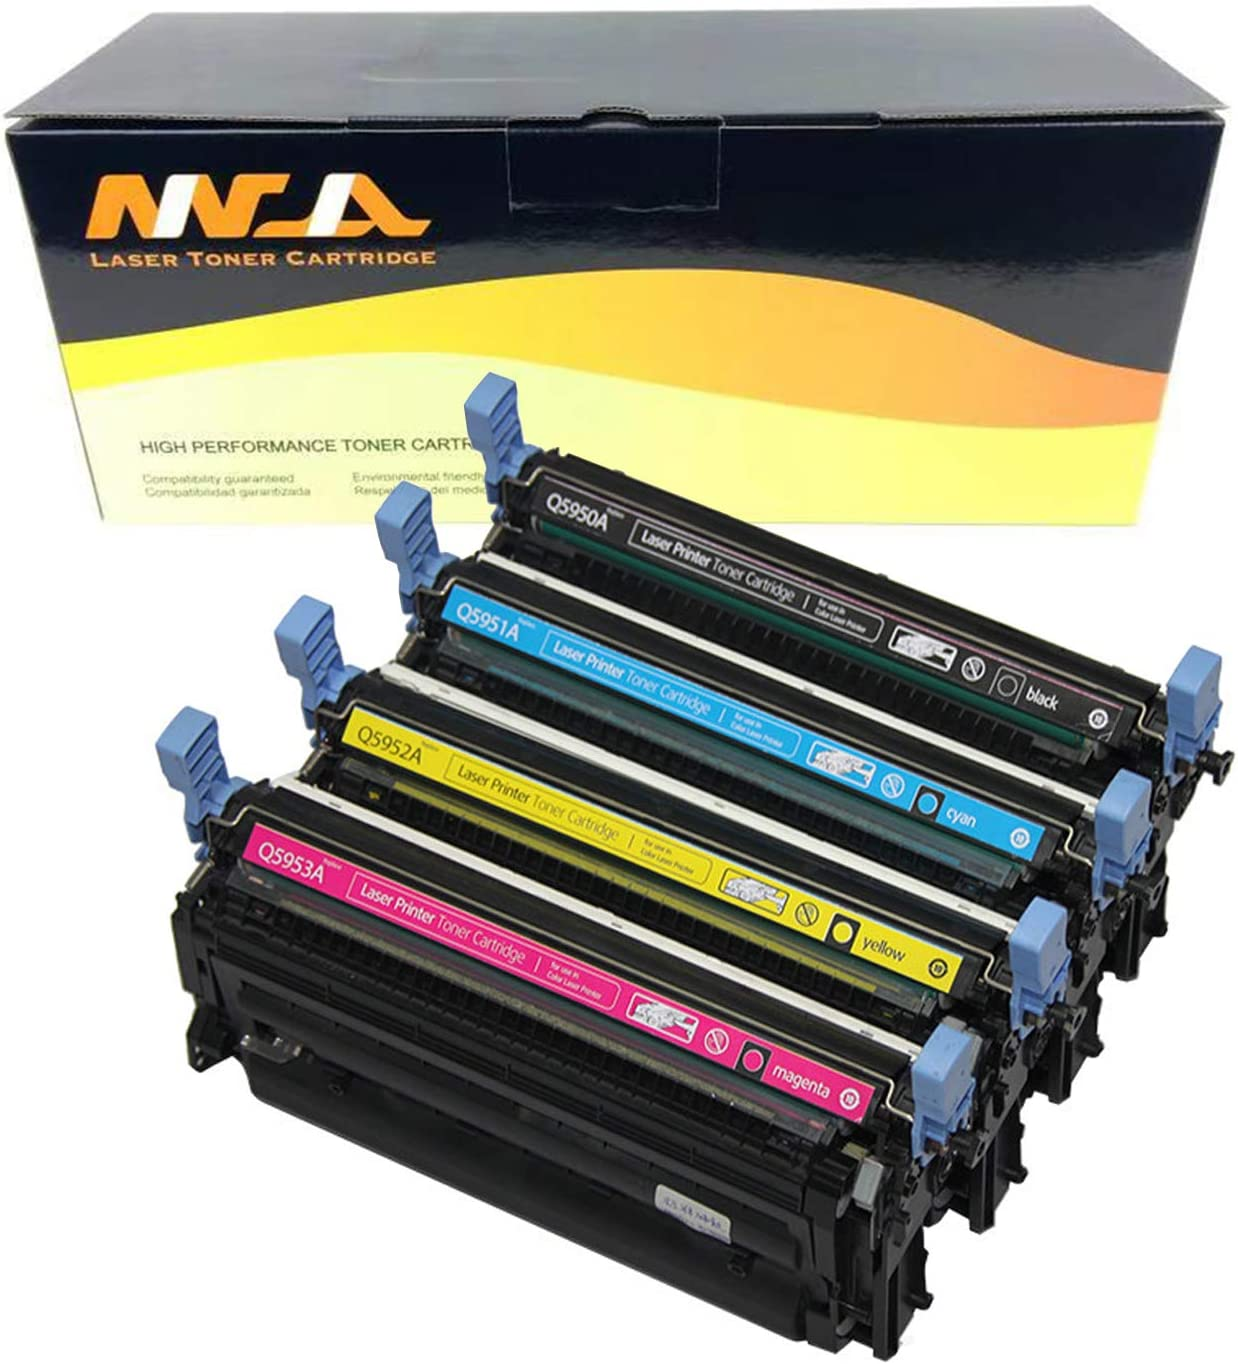 Ninjatoner Compatible Toner Cartridge Replacement for HP 643A Q5950A Q5951A Q5952A Q5953A Used in Color Laserjet 4700 4700DN 4700DTN 4700N 4700PH+ BKCMY, 4 Pack